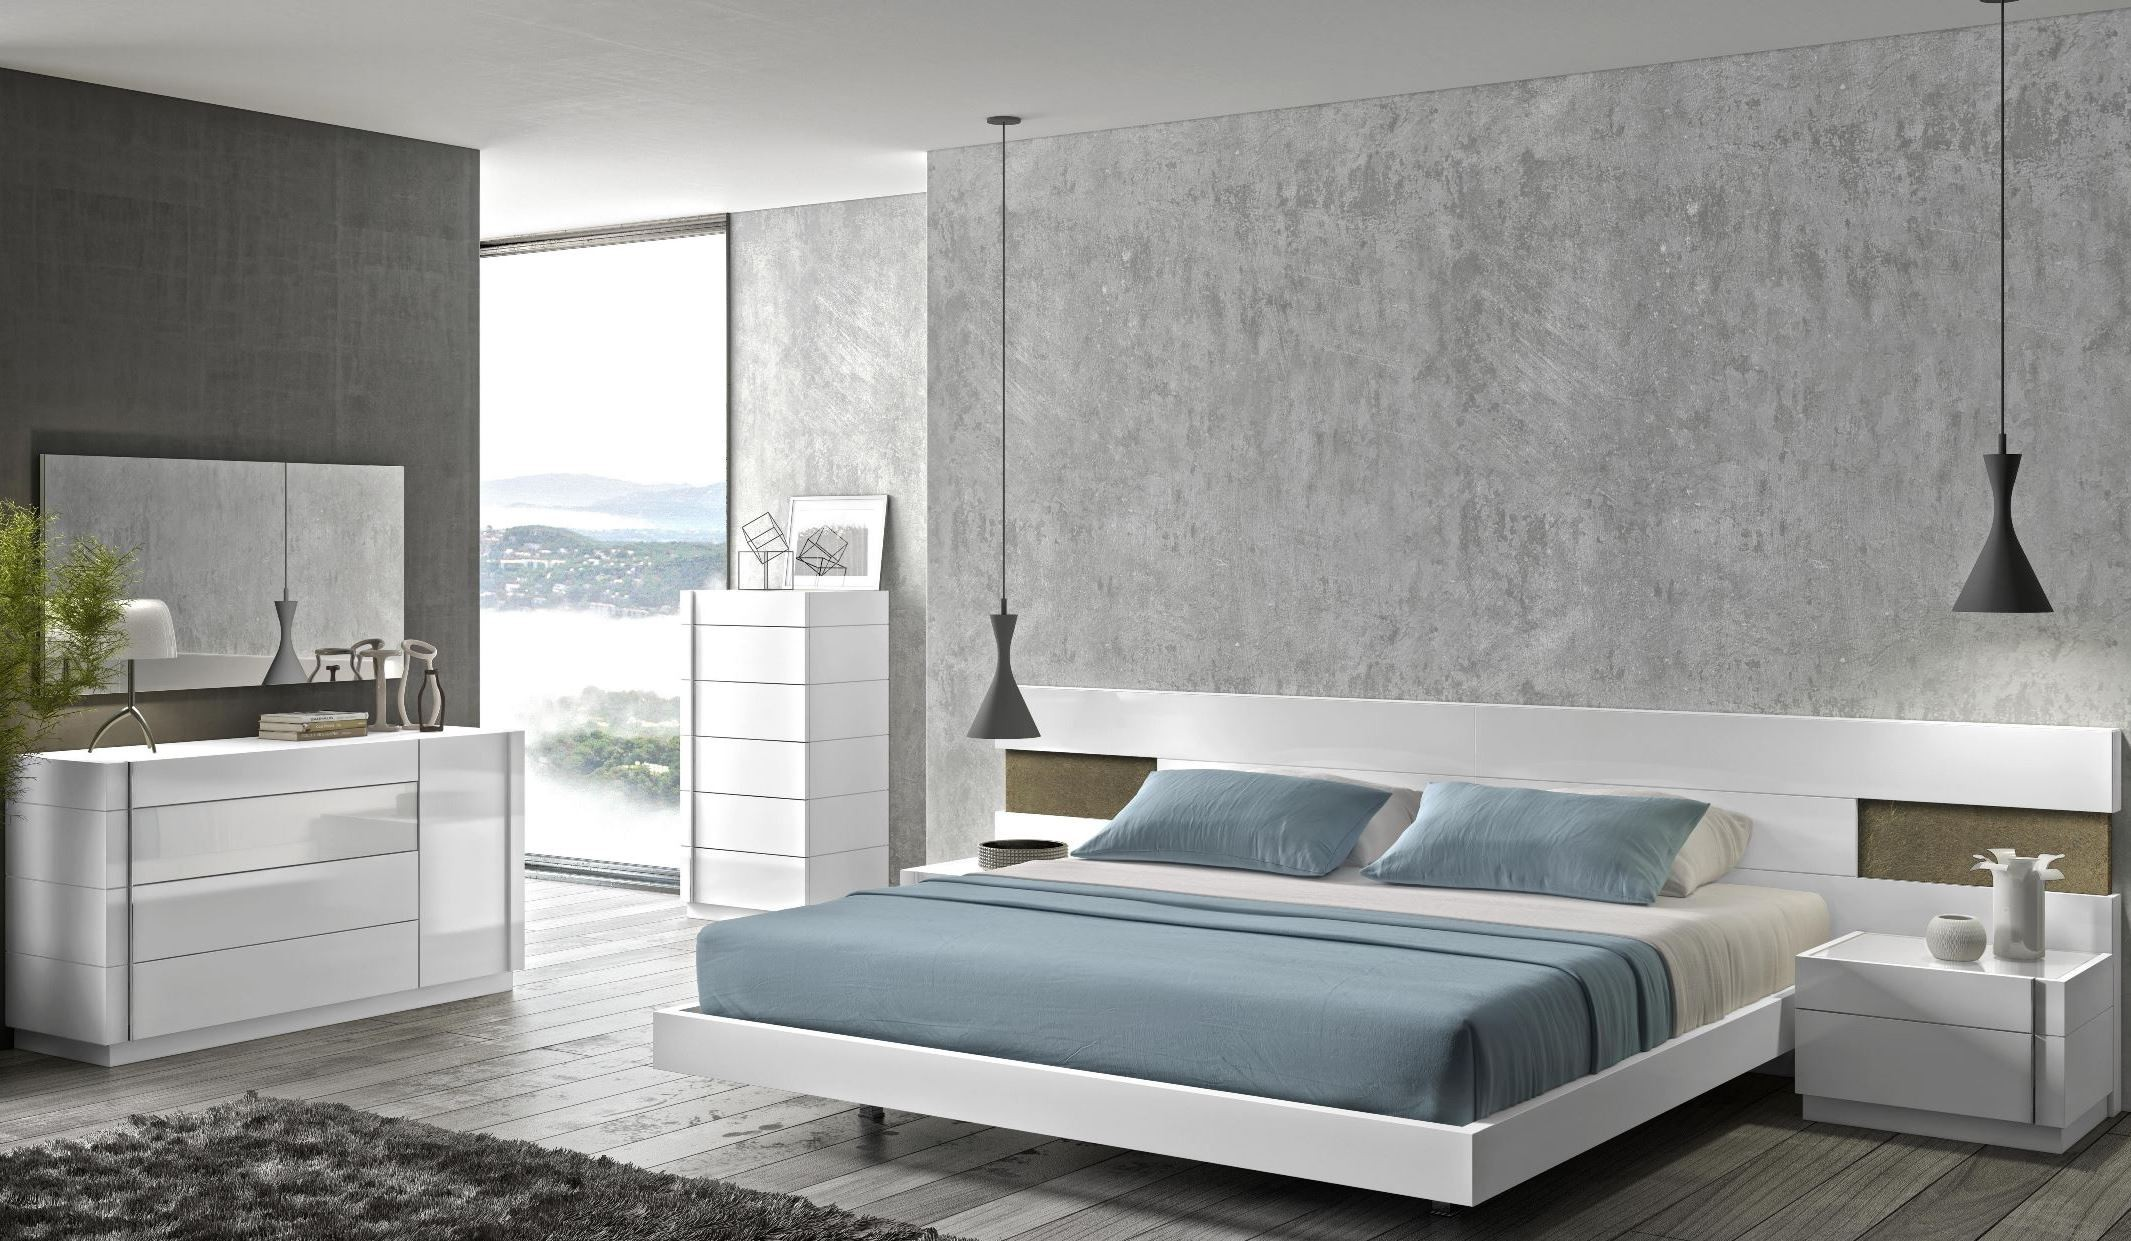 amora white lacquer platform bedroom set from j m